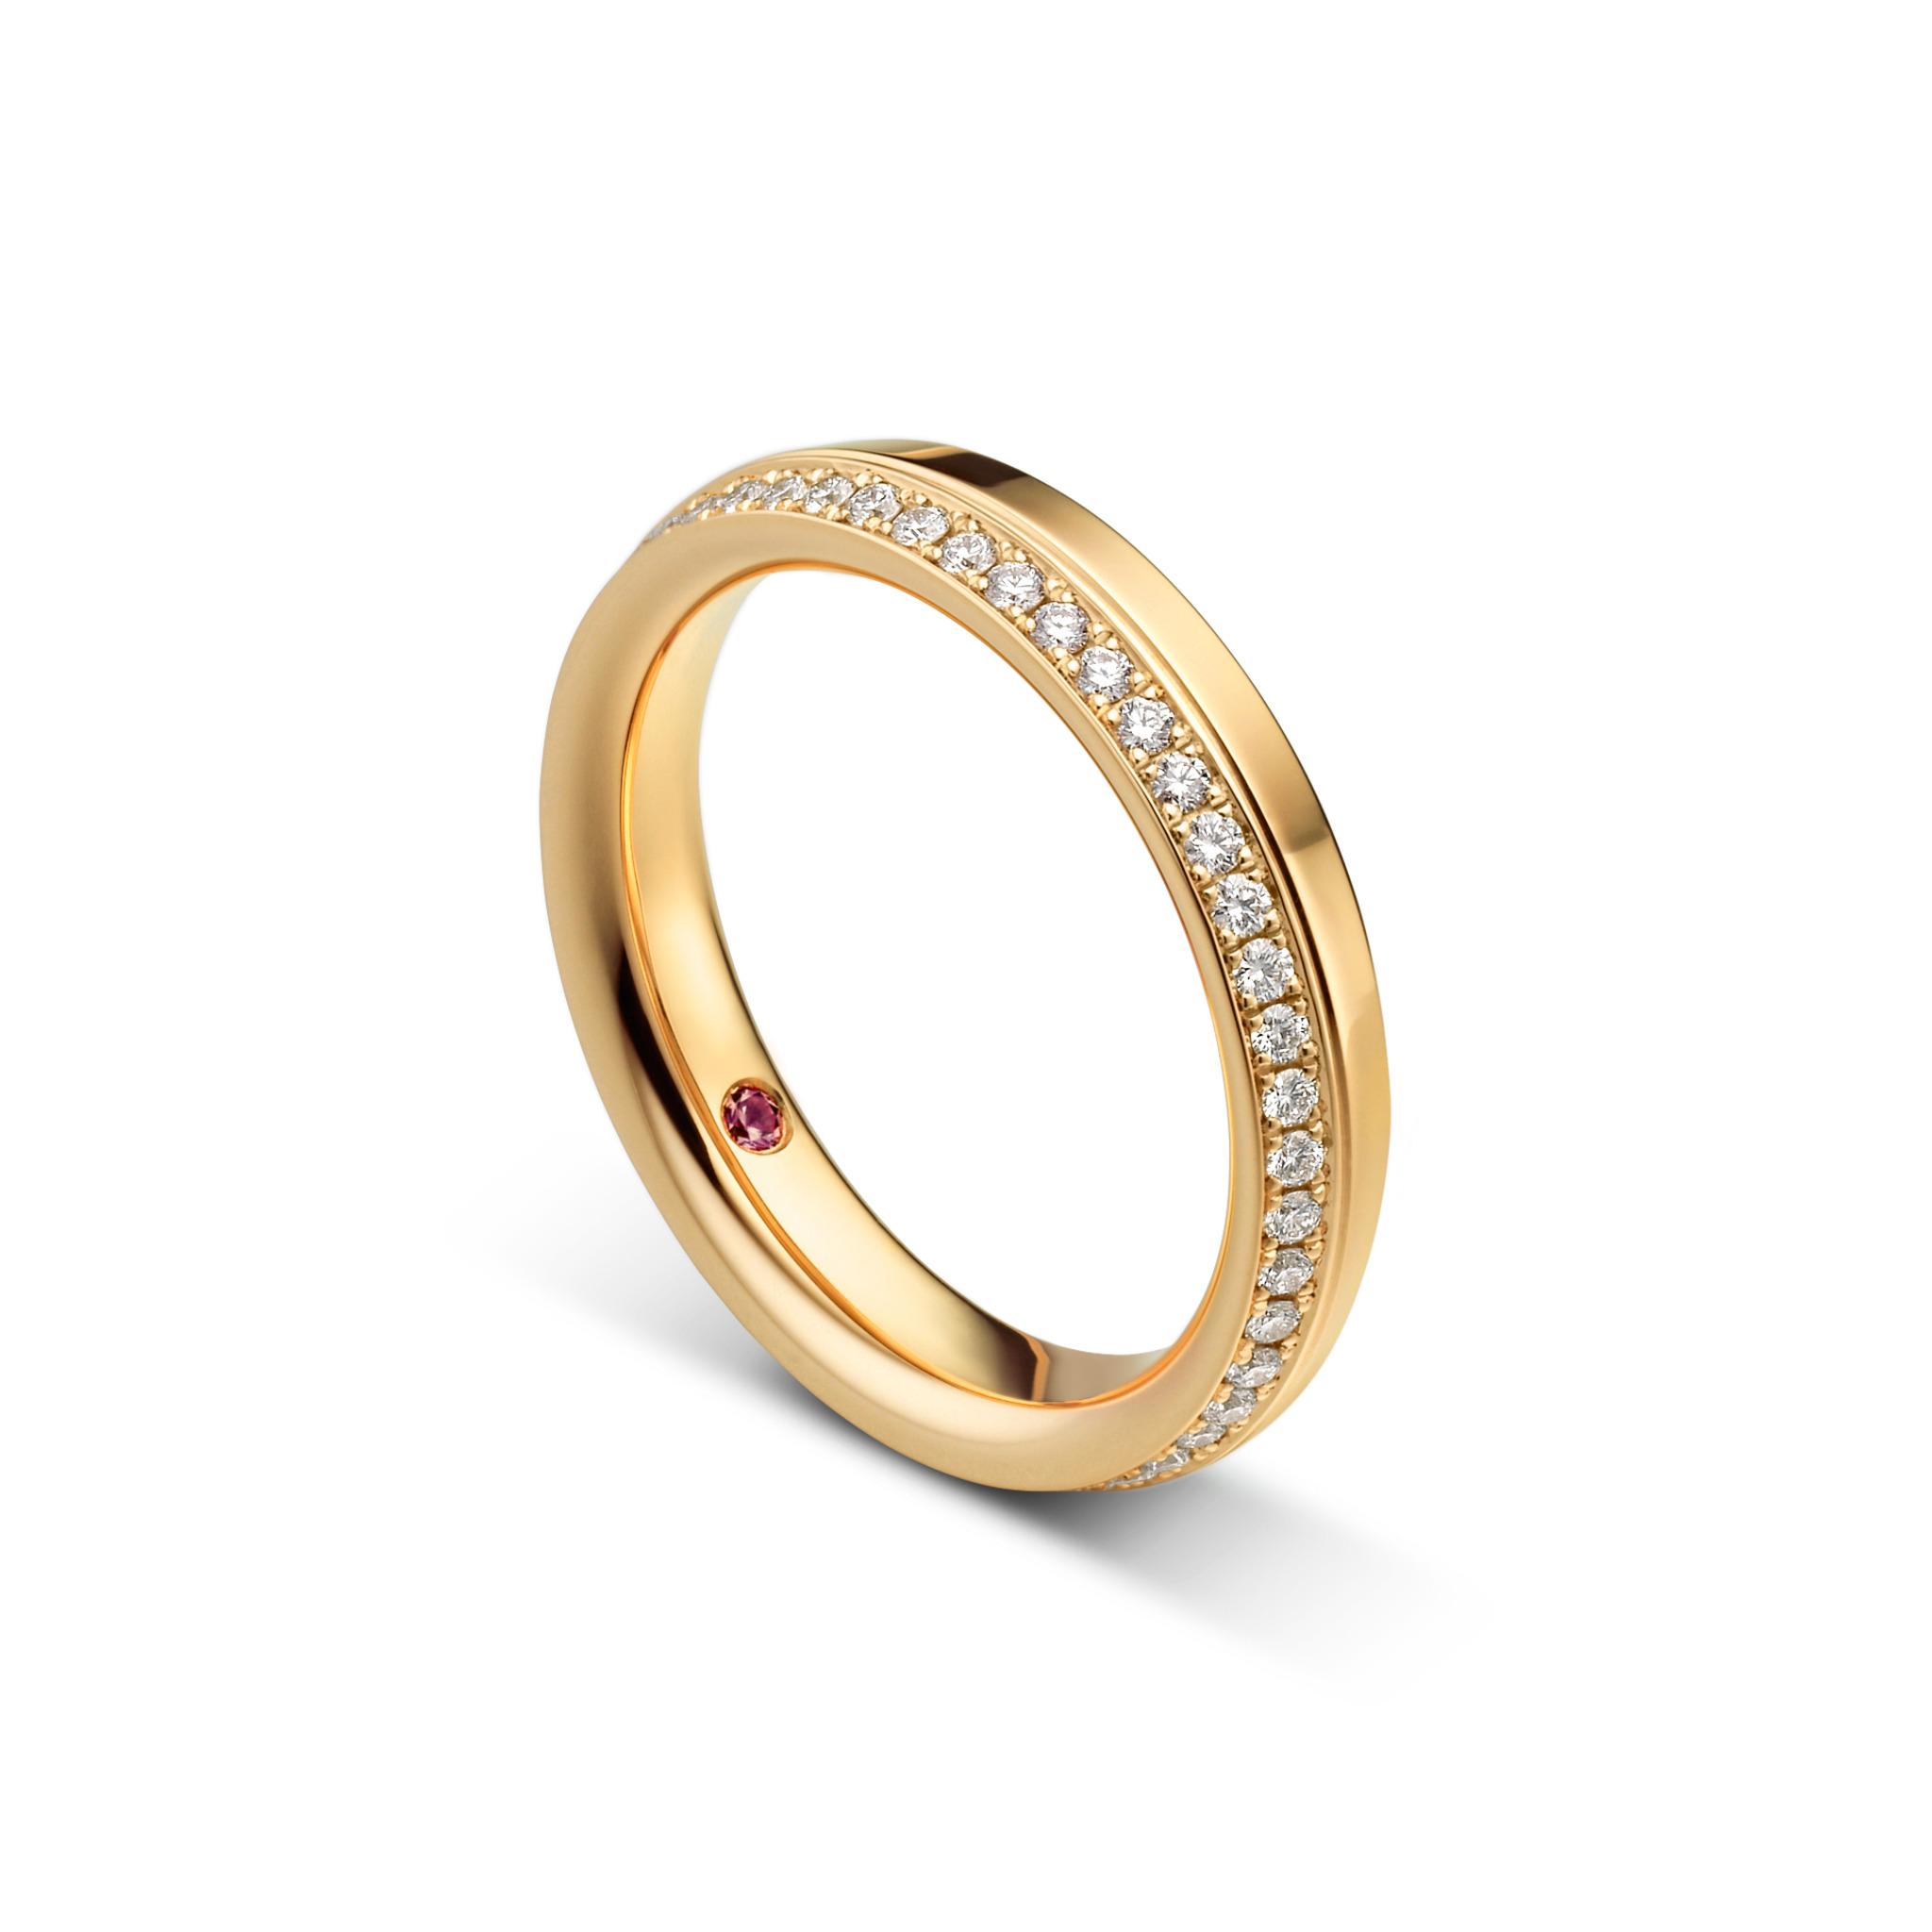 Wedding ring with diamonds